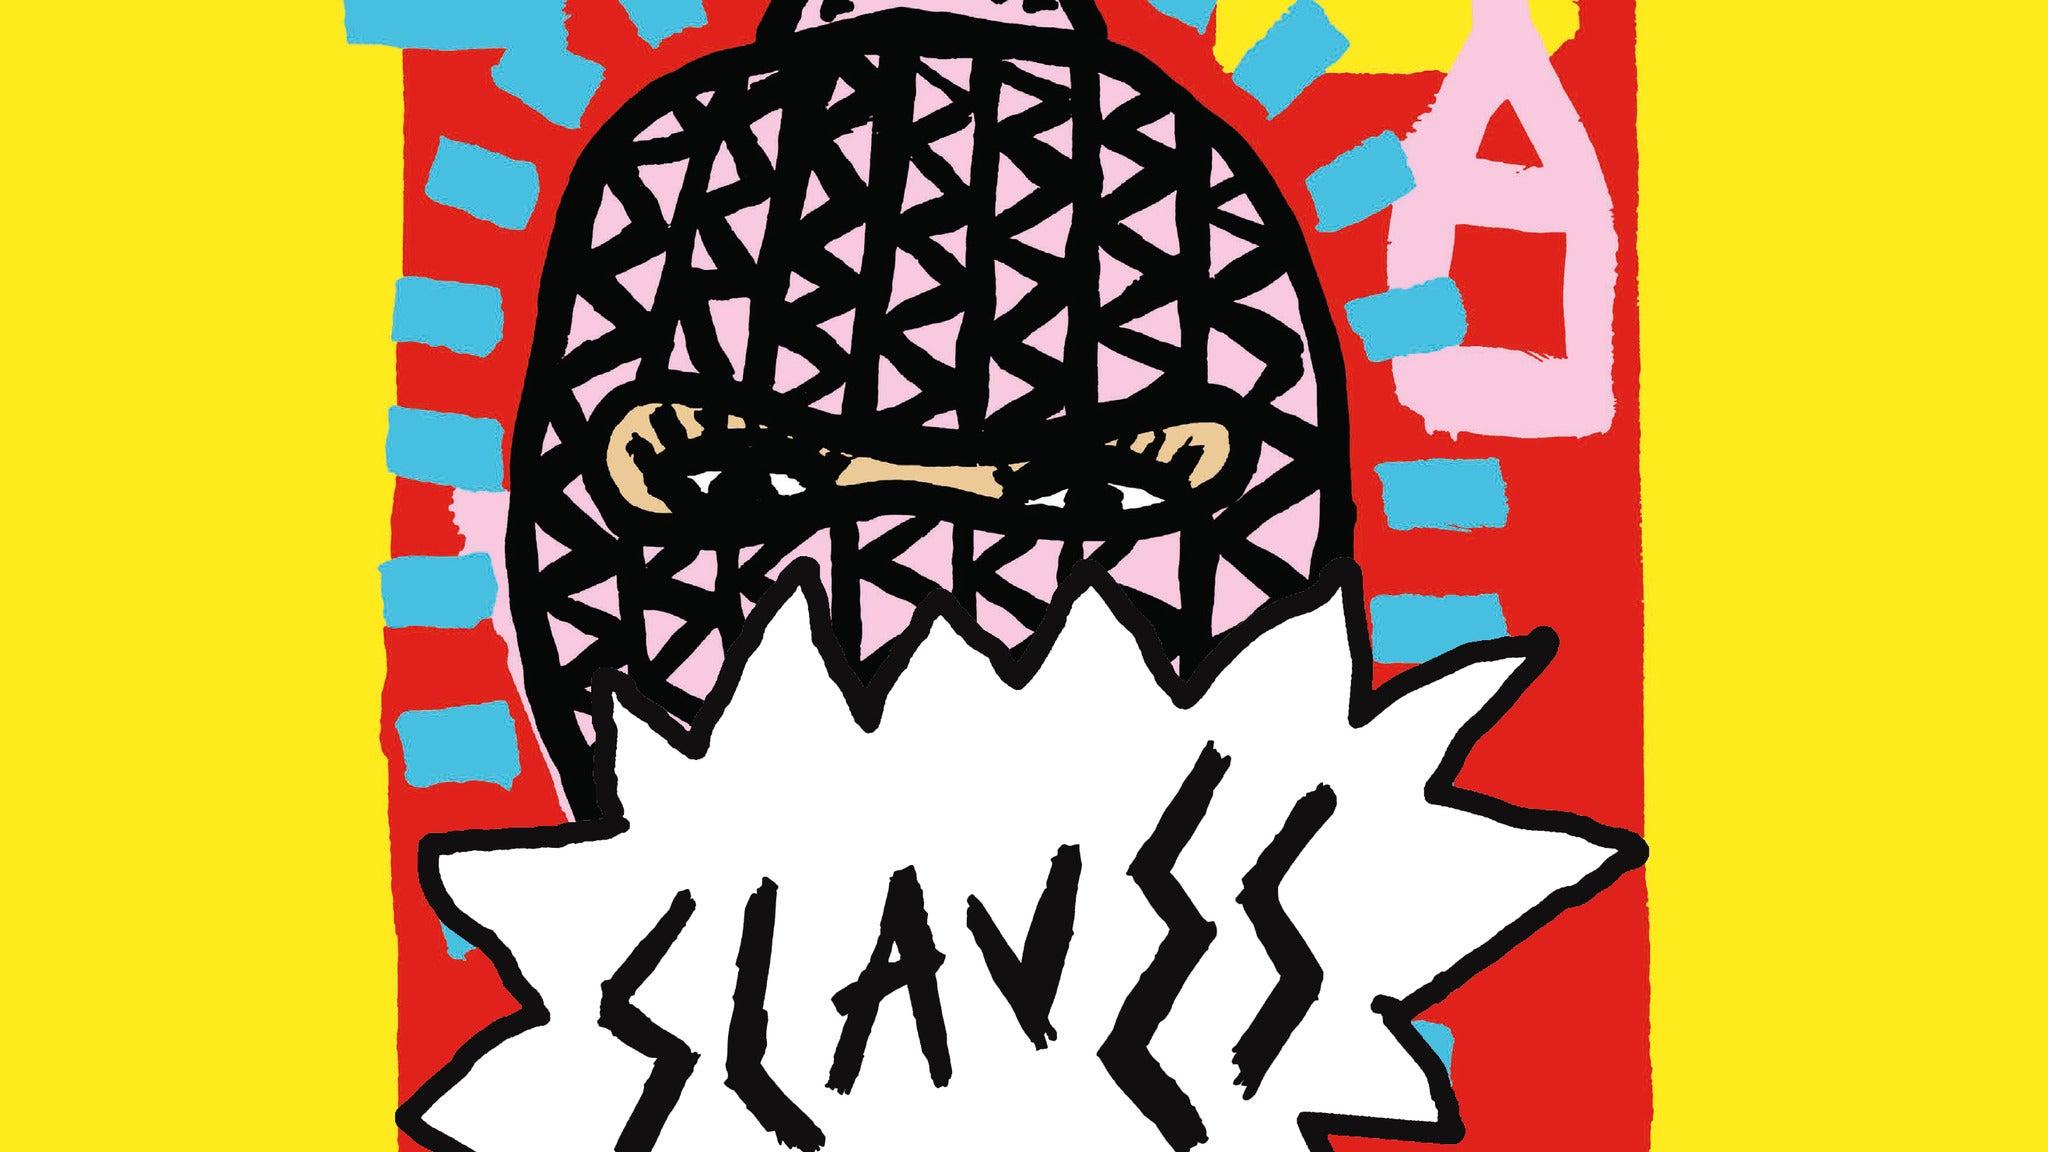 Slaves (UK) at Aftershock